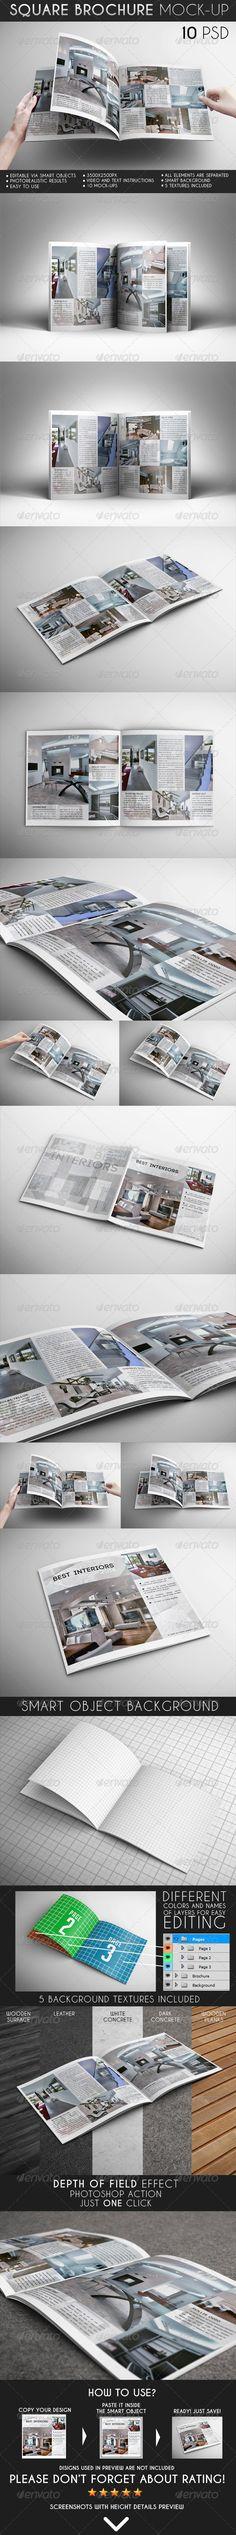 Brochure Mock-Up   Download: http://graphicriver.net/item/square-brochure-mockup/6838423?ref=ksioks